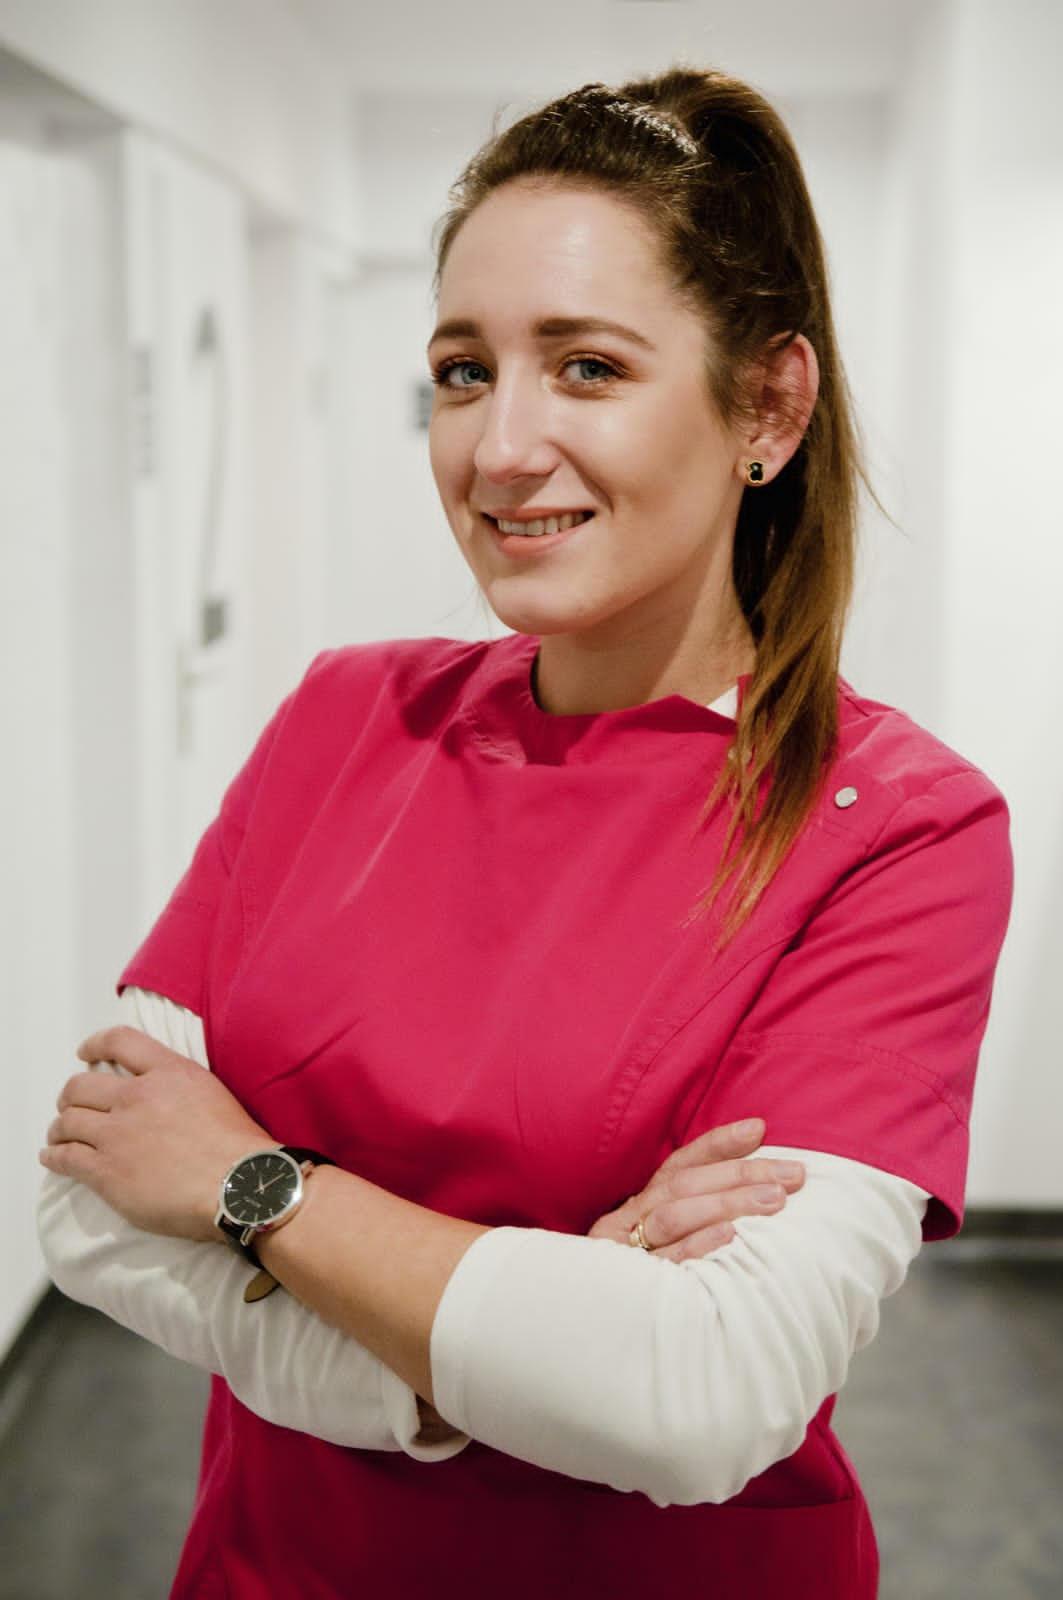 Joanna Wittek